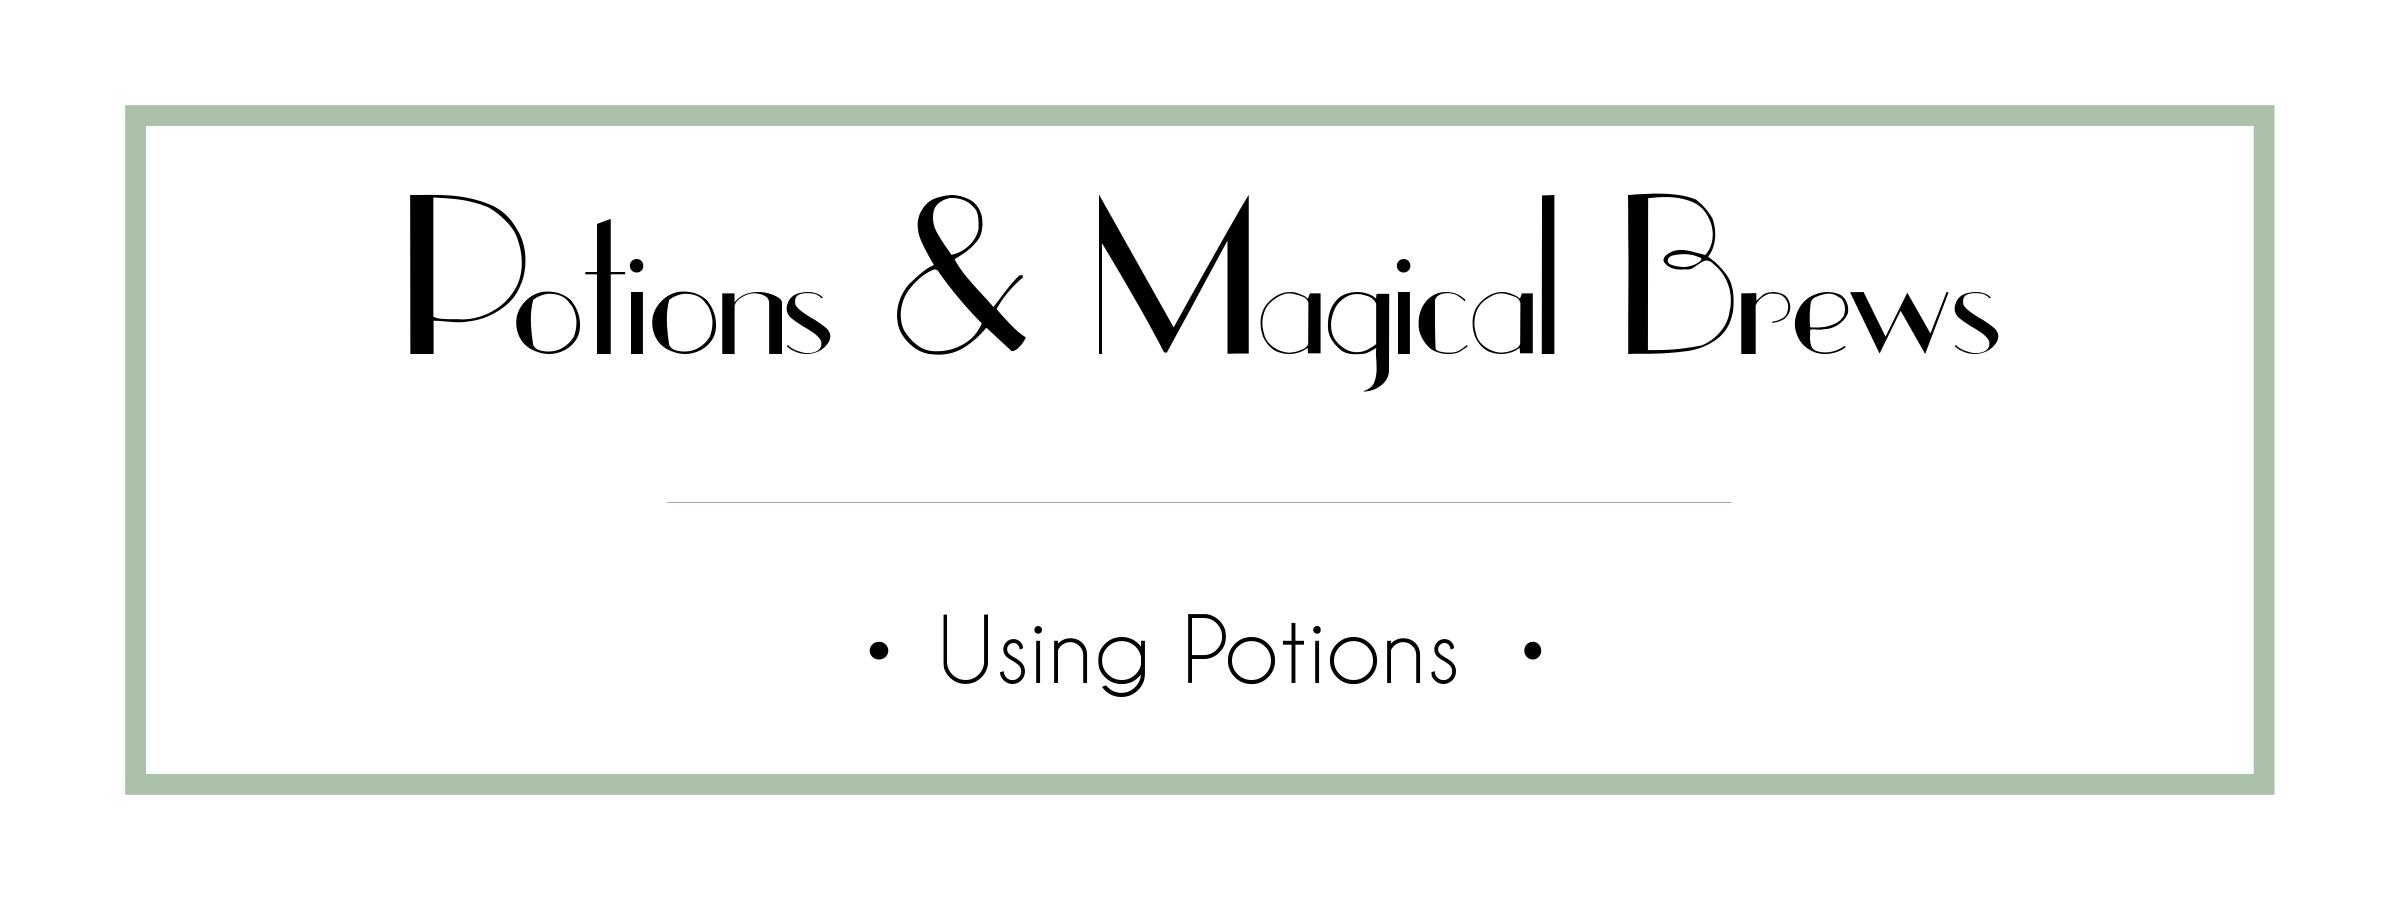 Potions & Magical Brews - Using Potions